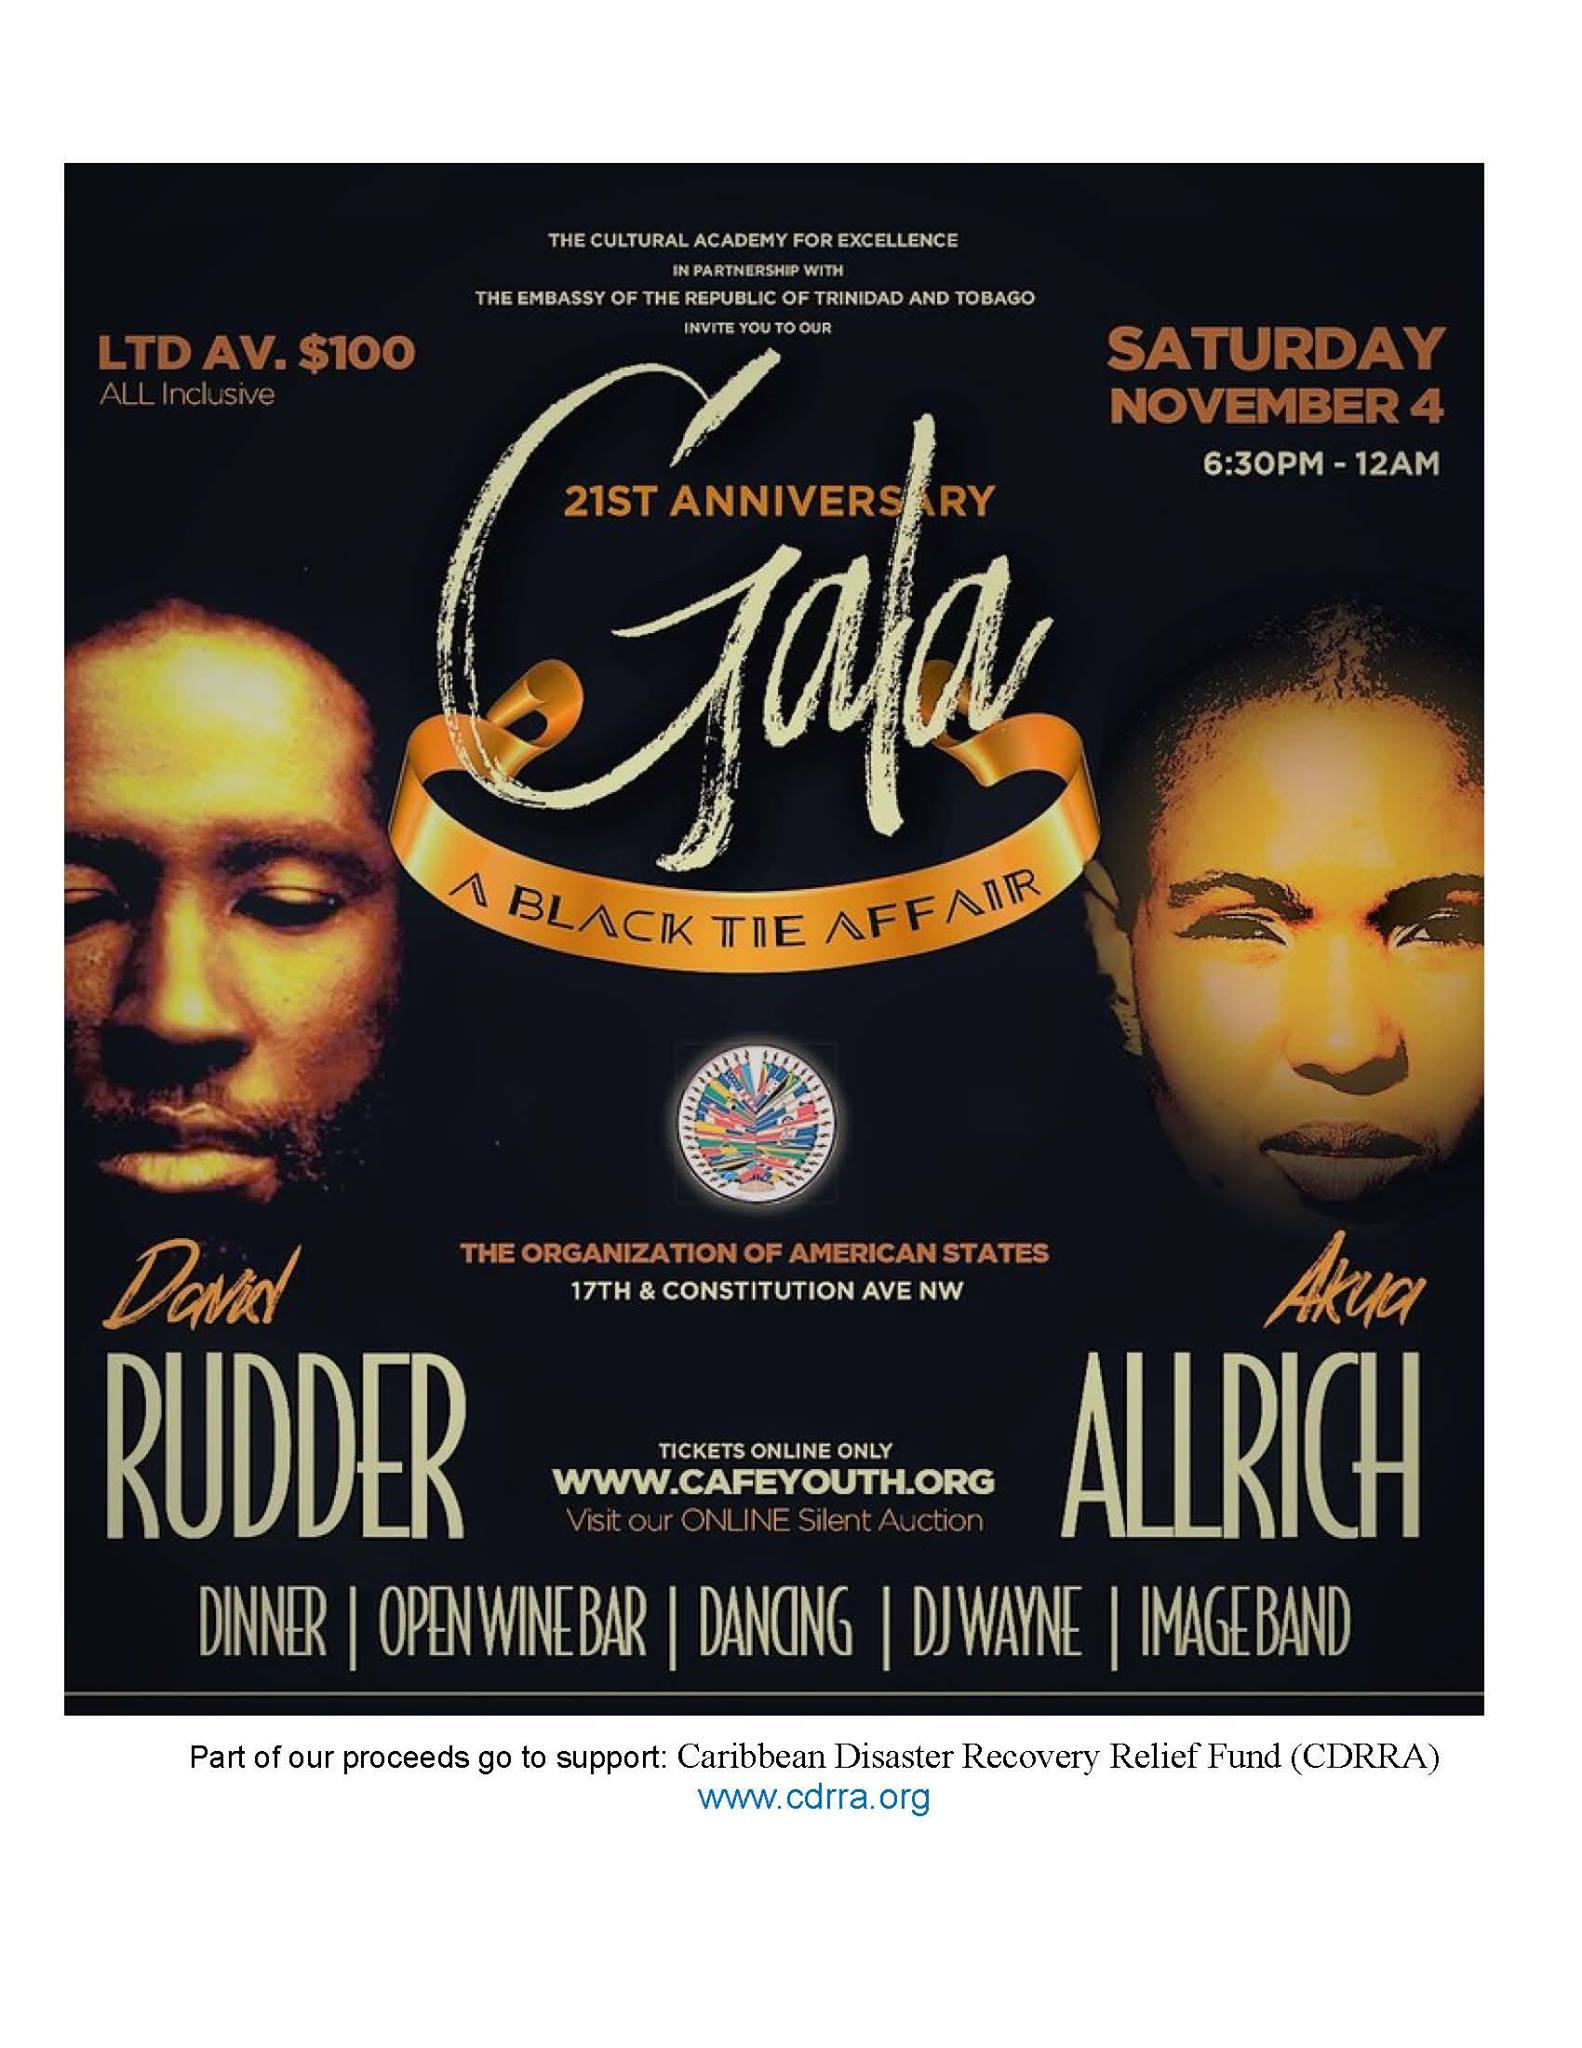 cb2ec75cf Akua   The Tribe   CAFE s 21st Anniversary Gala  A Black Tie Affair SAT nov  4